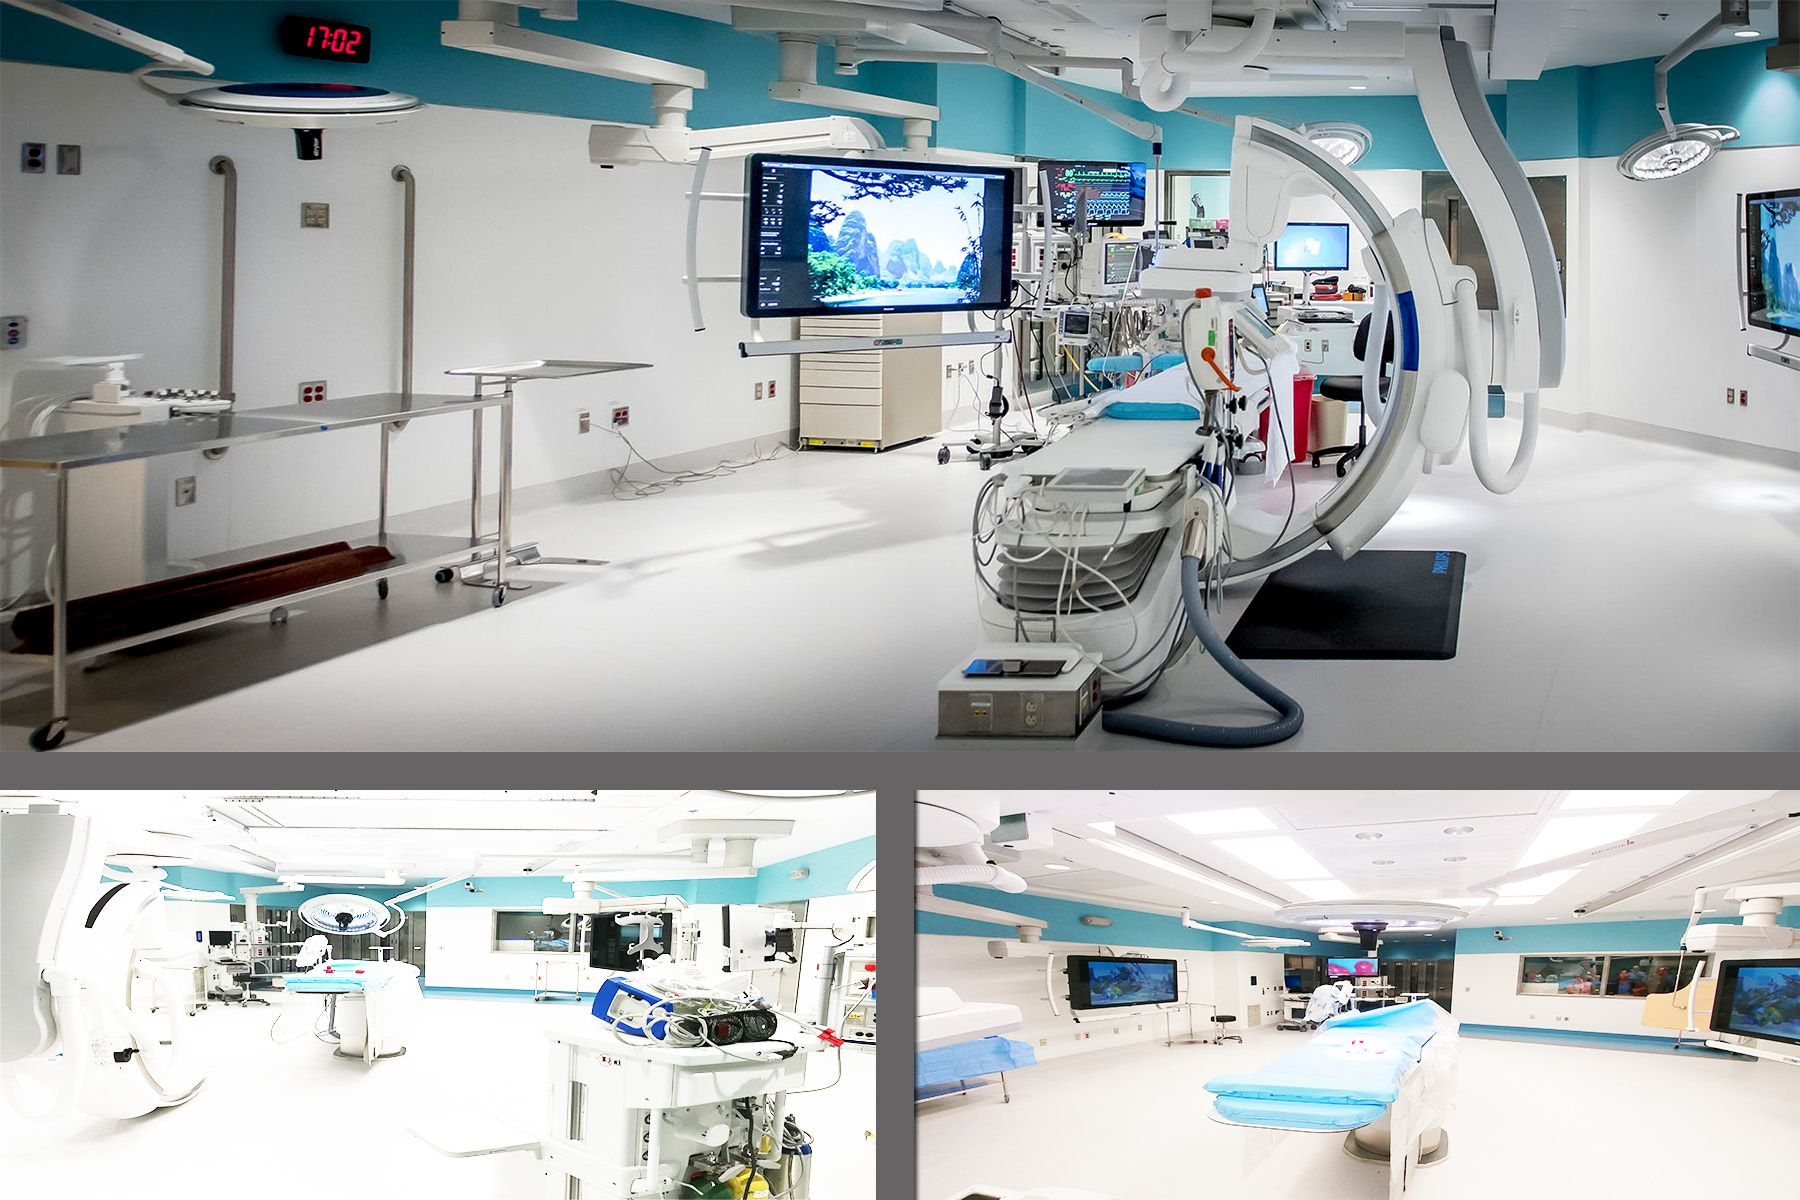 Surgery Department - Hybrid O.R.